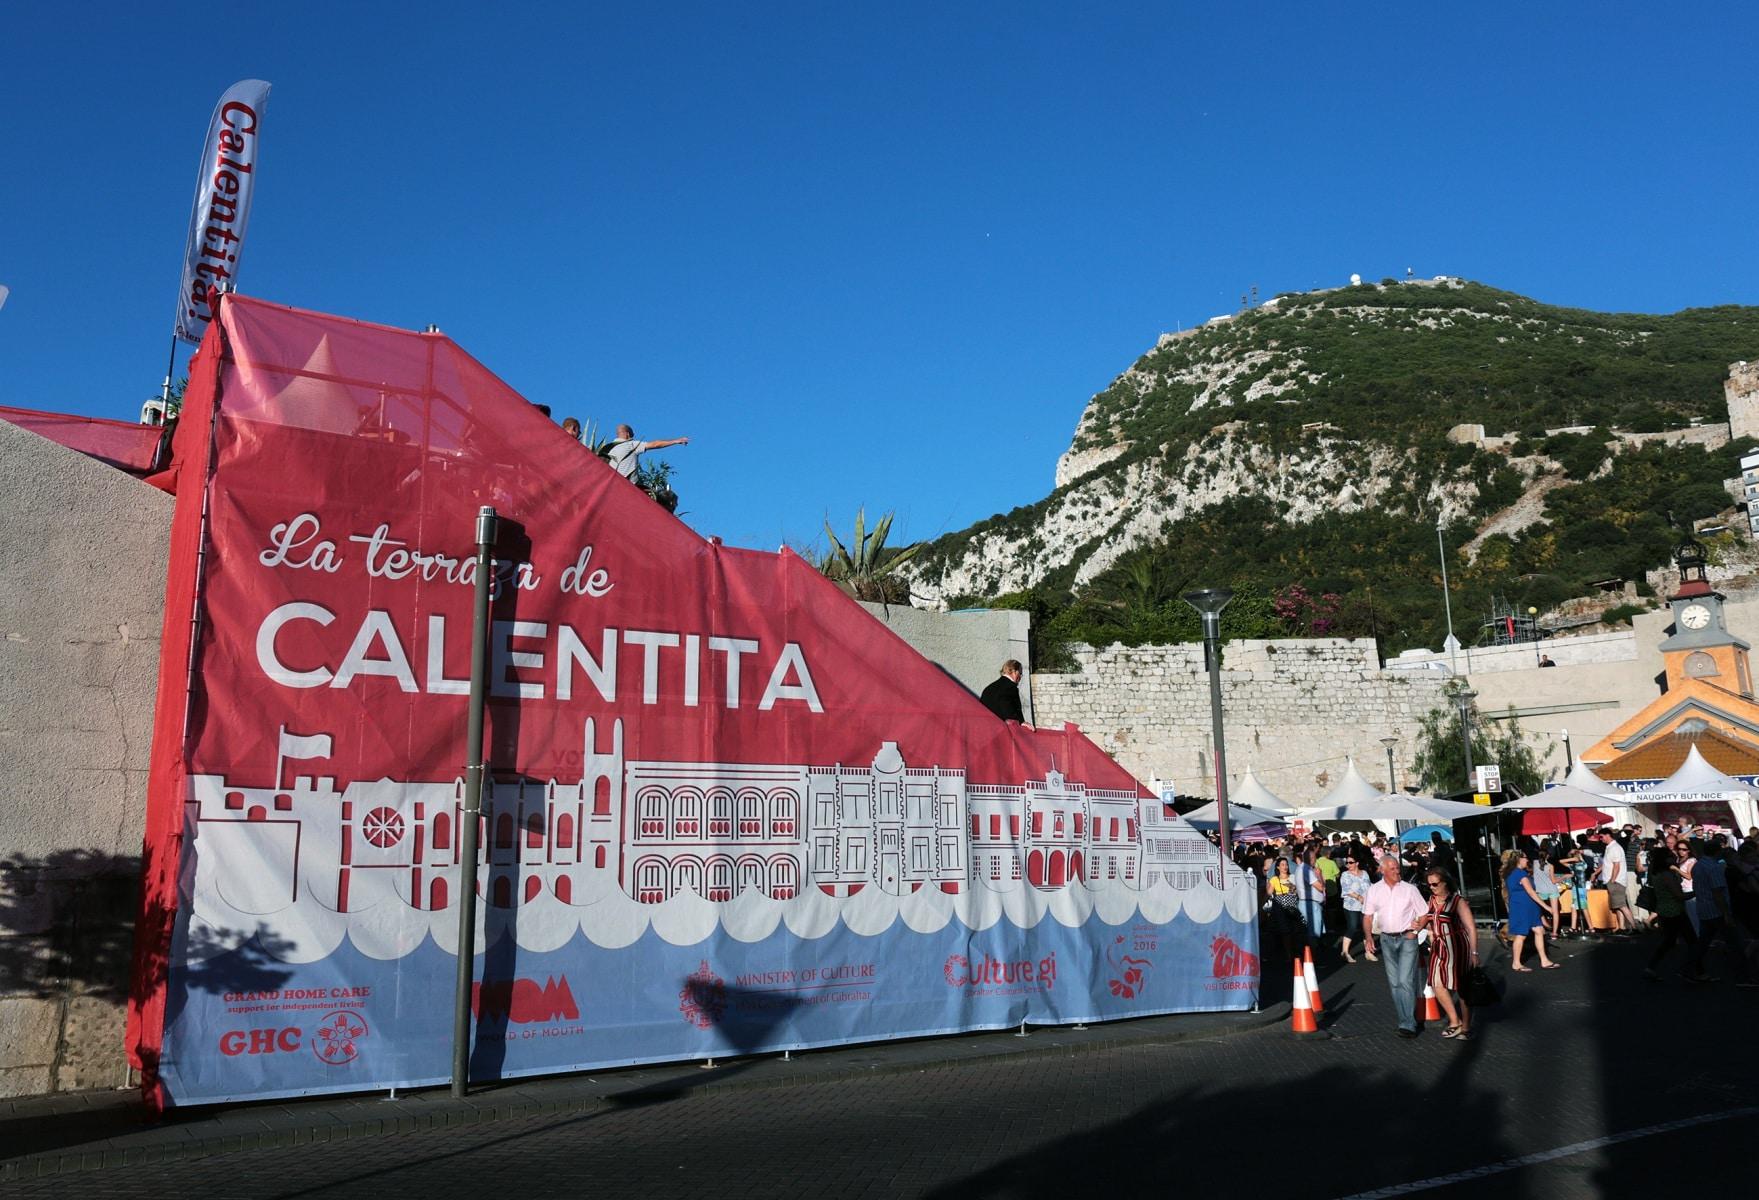 18-jun-2016-noche-de-la-calentita-en-gibraltar_27732673142_o